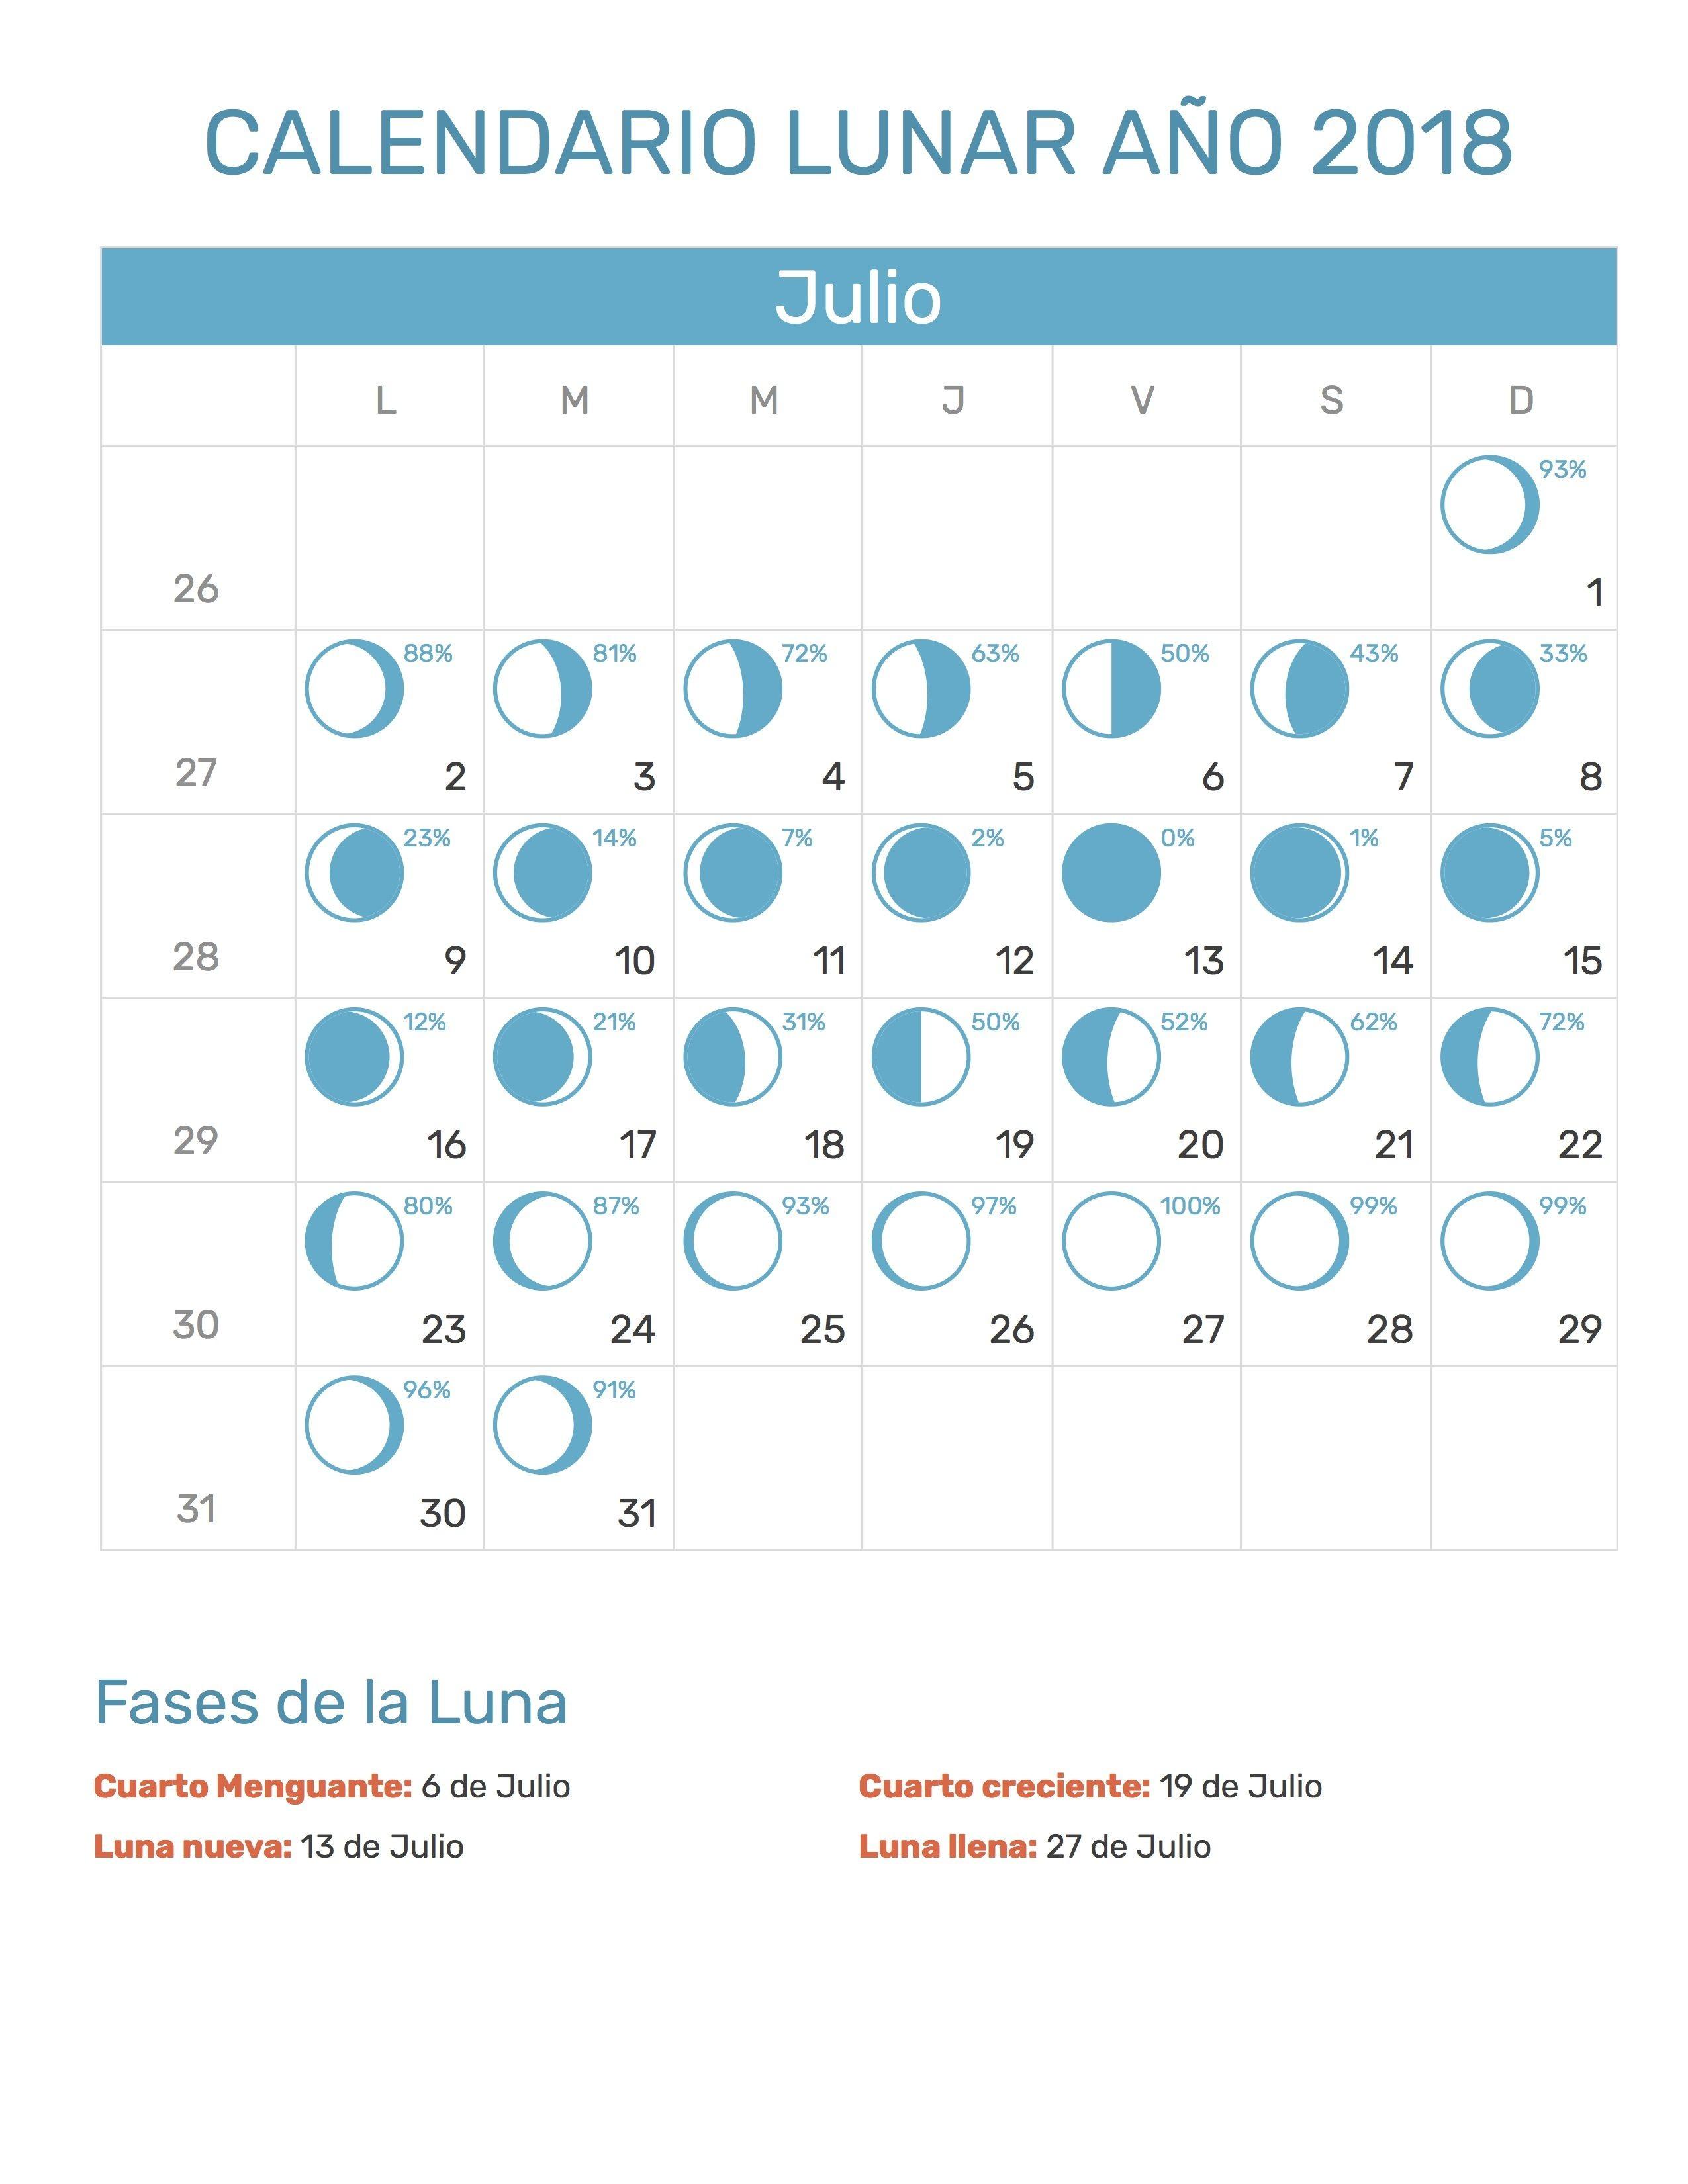 Calendario Imprimir Agosto Más Populares Mclaren Lou Lmkloger En Pinterest